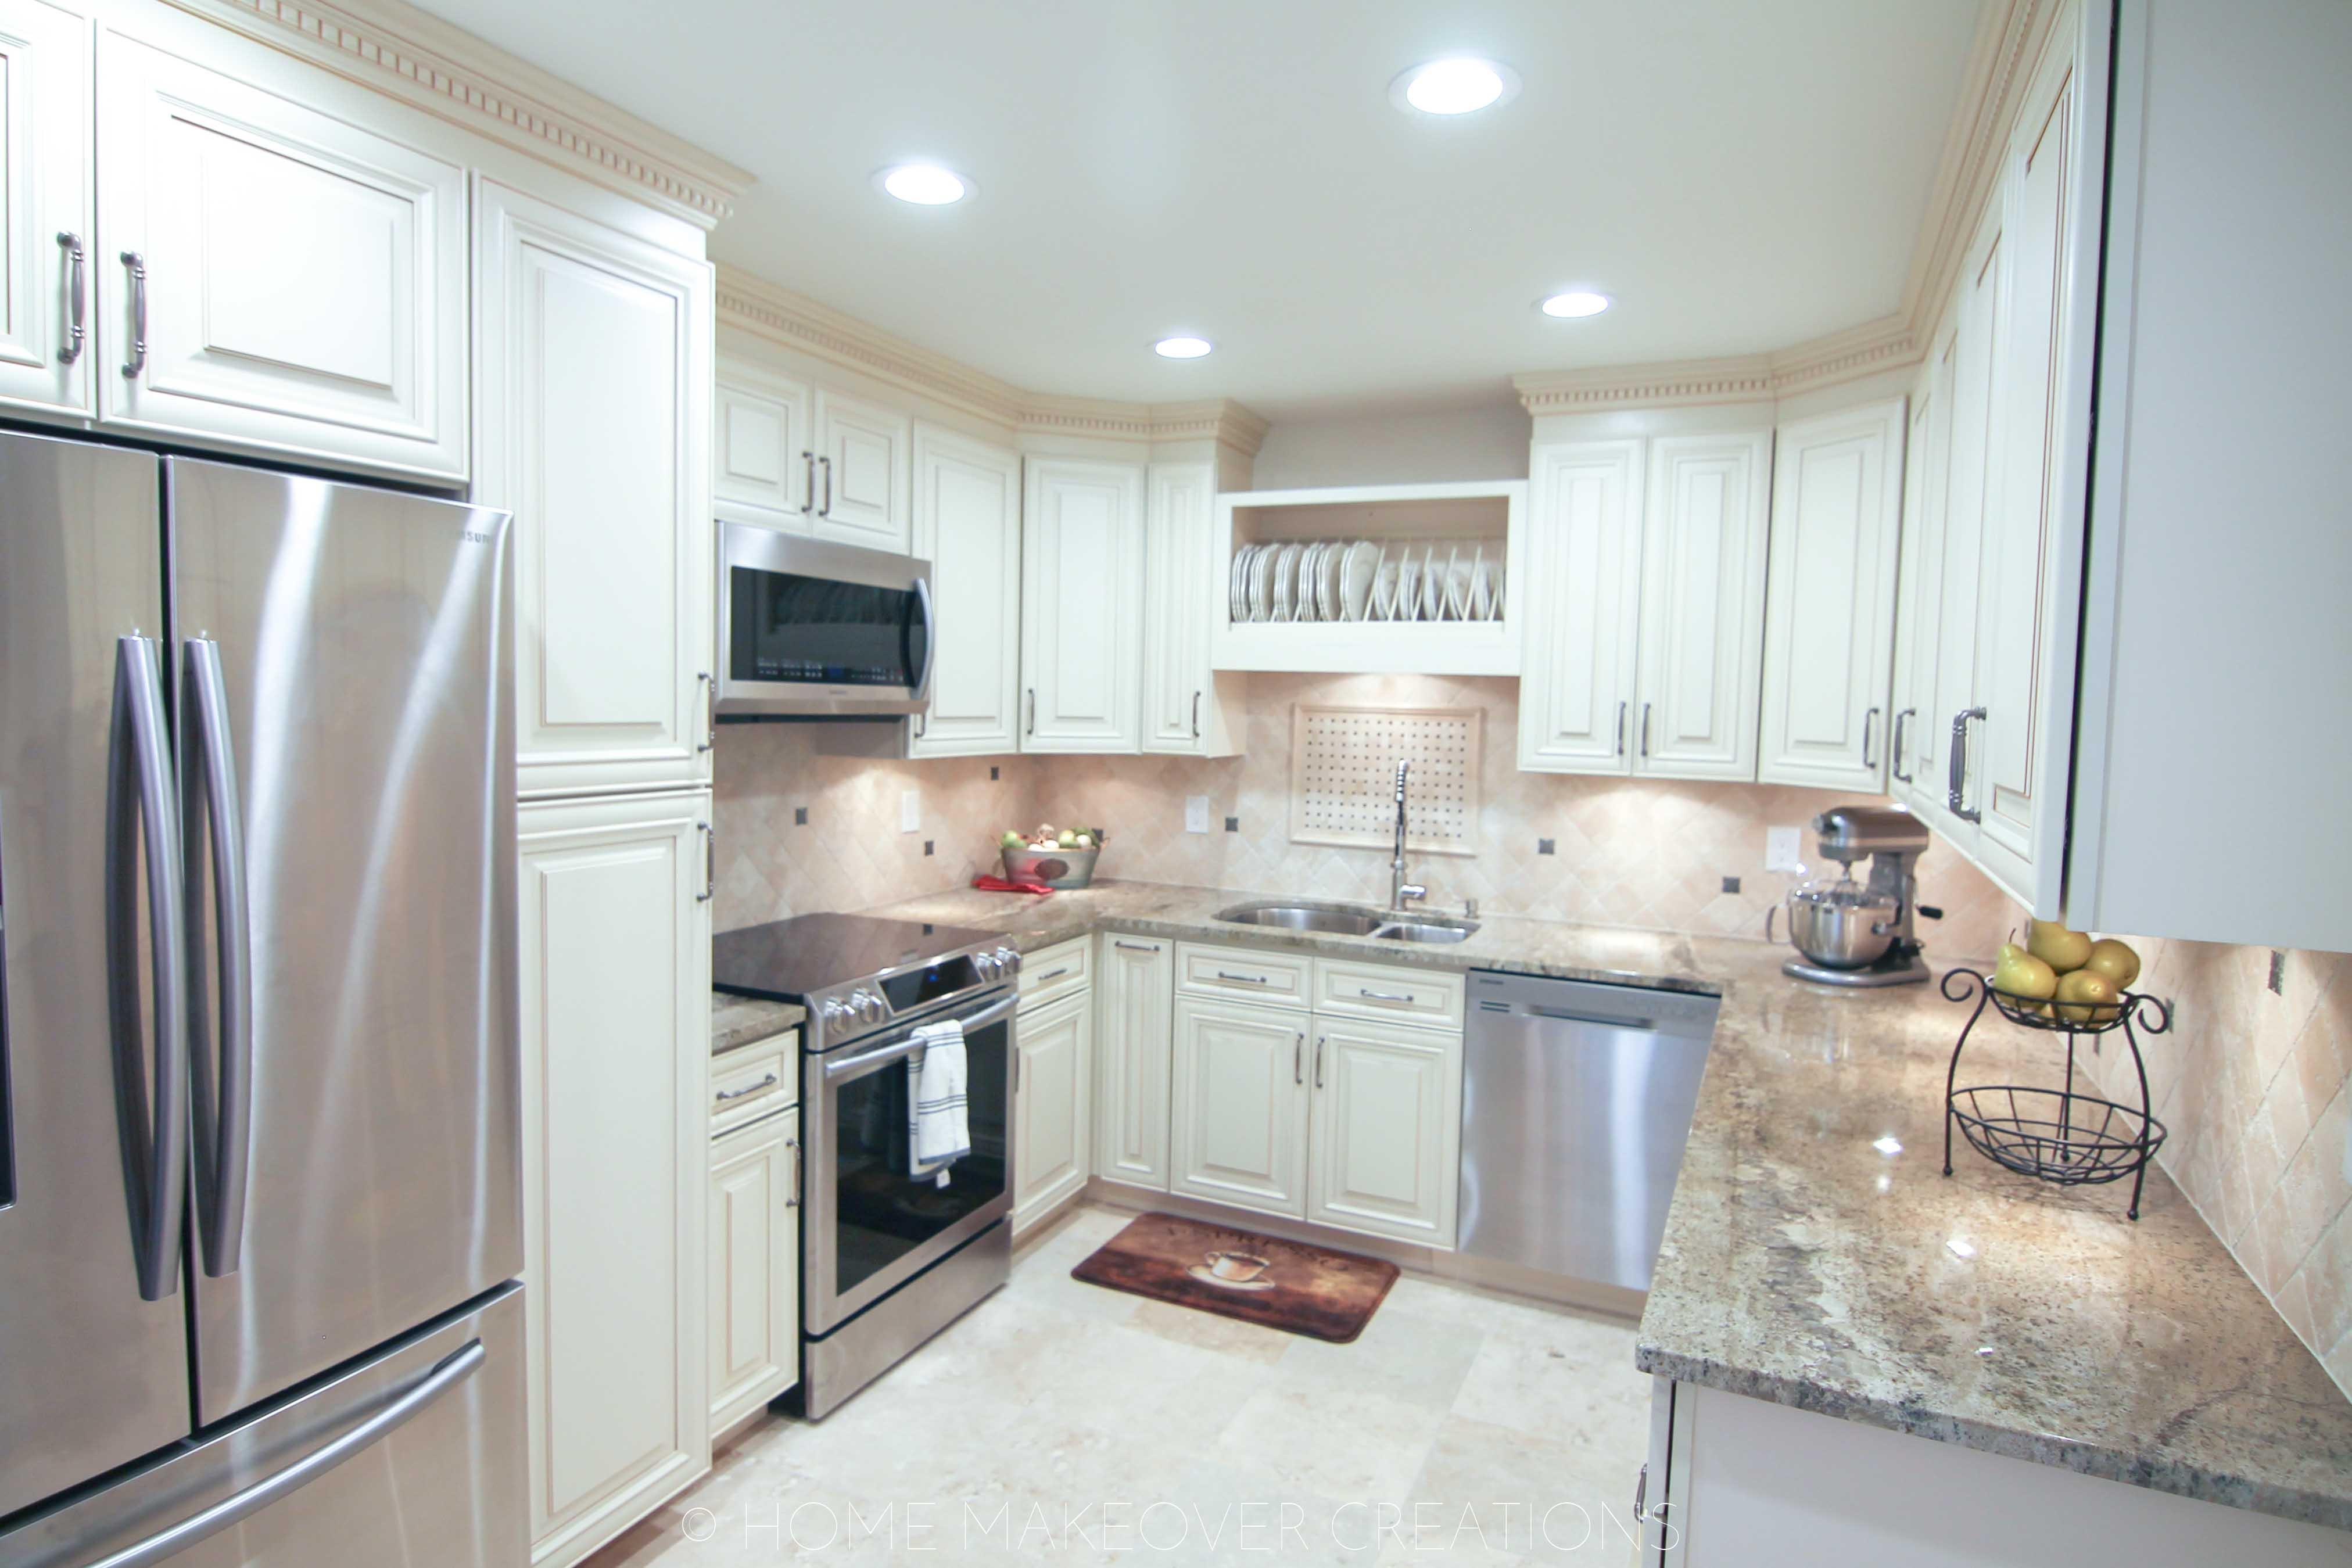 Bathroom Furniture Arizona Kitchen Remodel kitchen remodel mesa arizona 12 home makeover creations